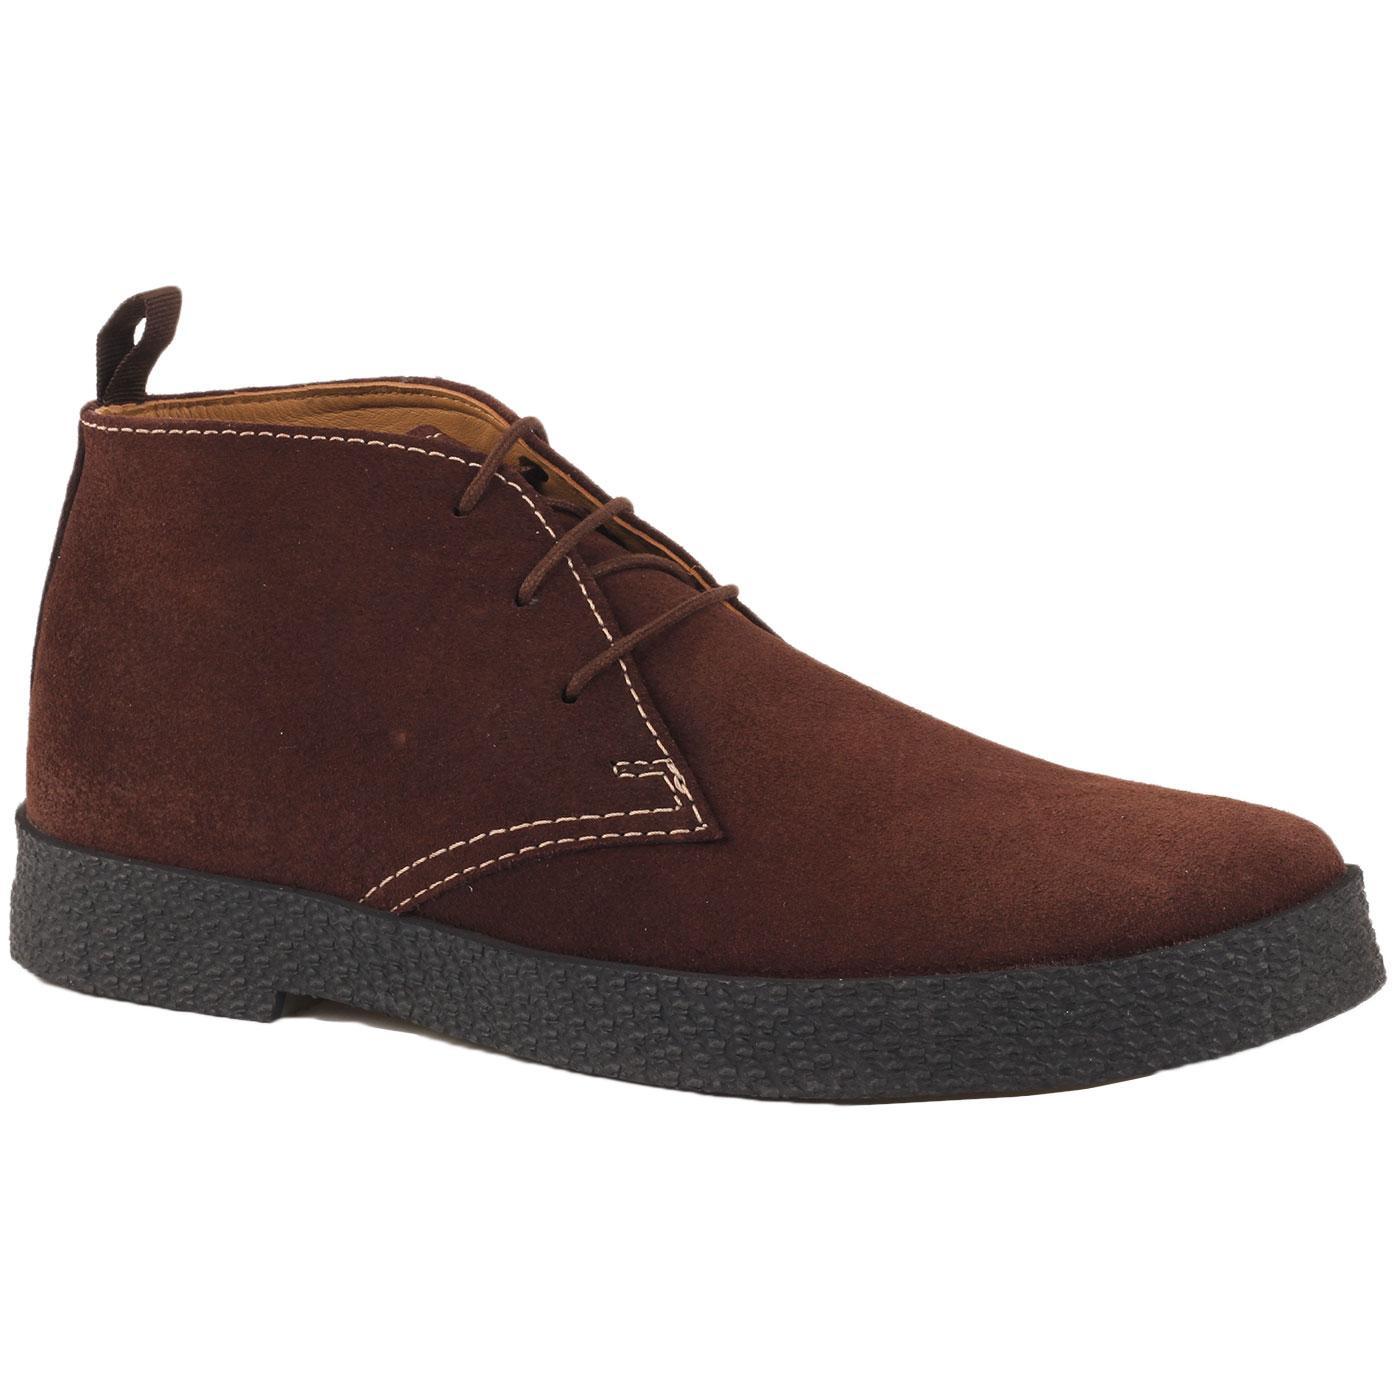 Madcap England Cisco 60s Mod Suede Playboy Chukka Boots in Dark Brown